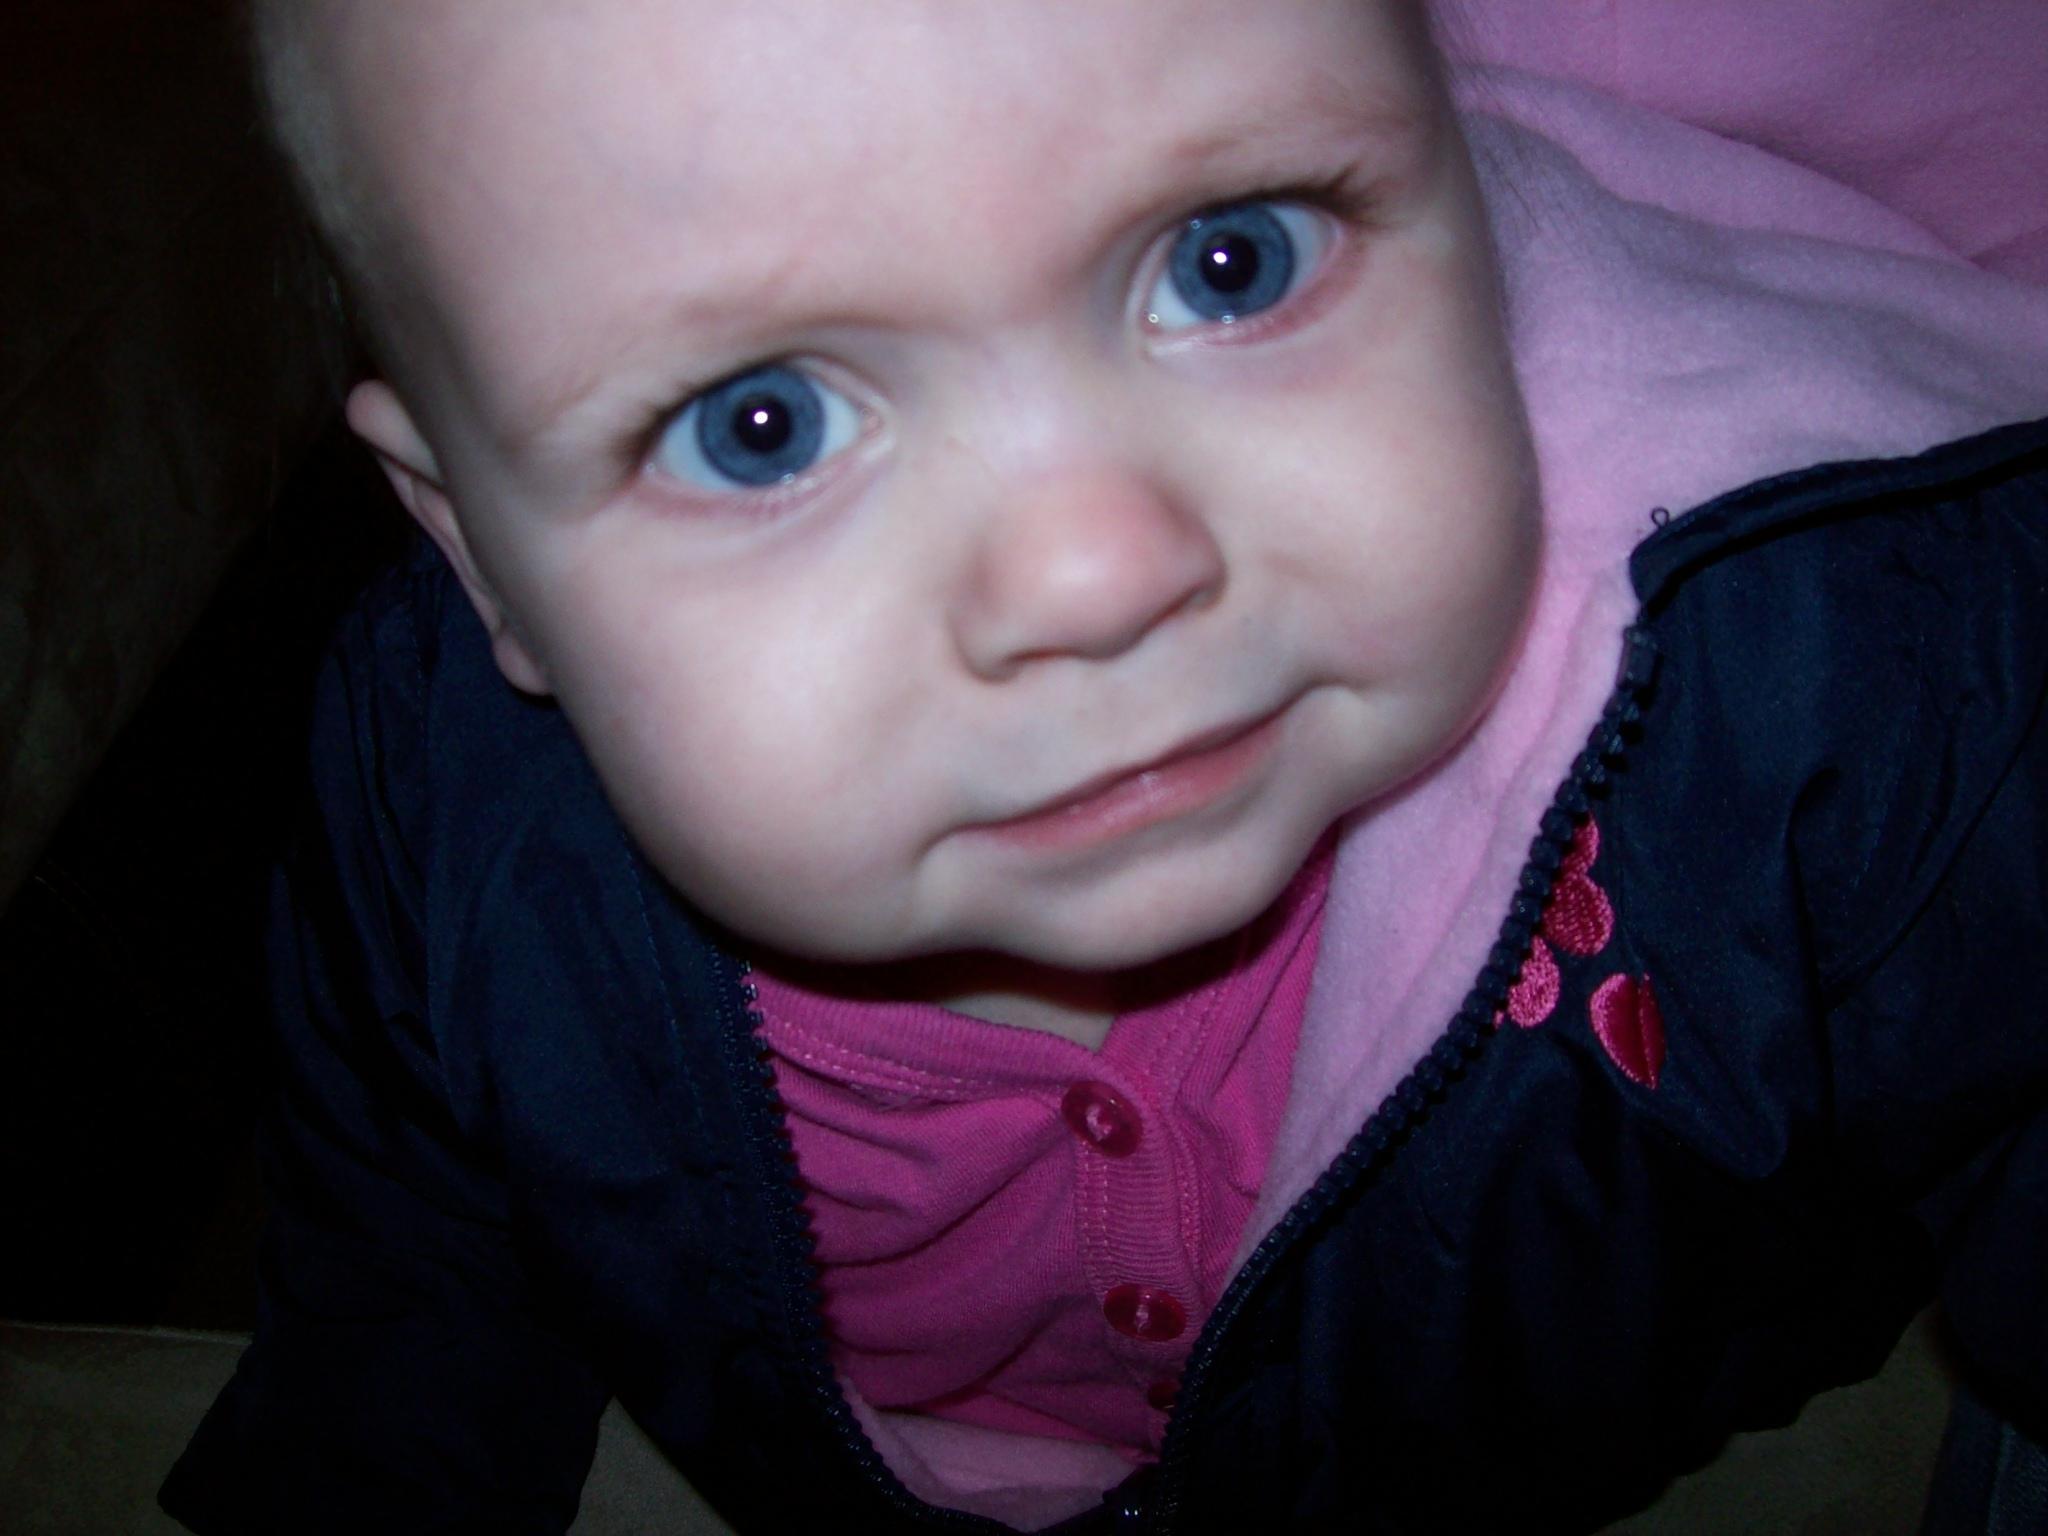 crazy baby face